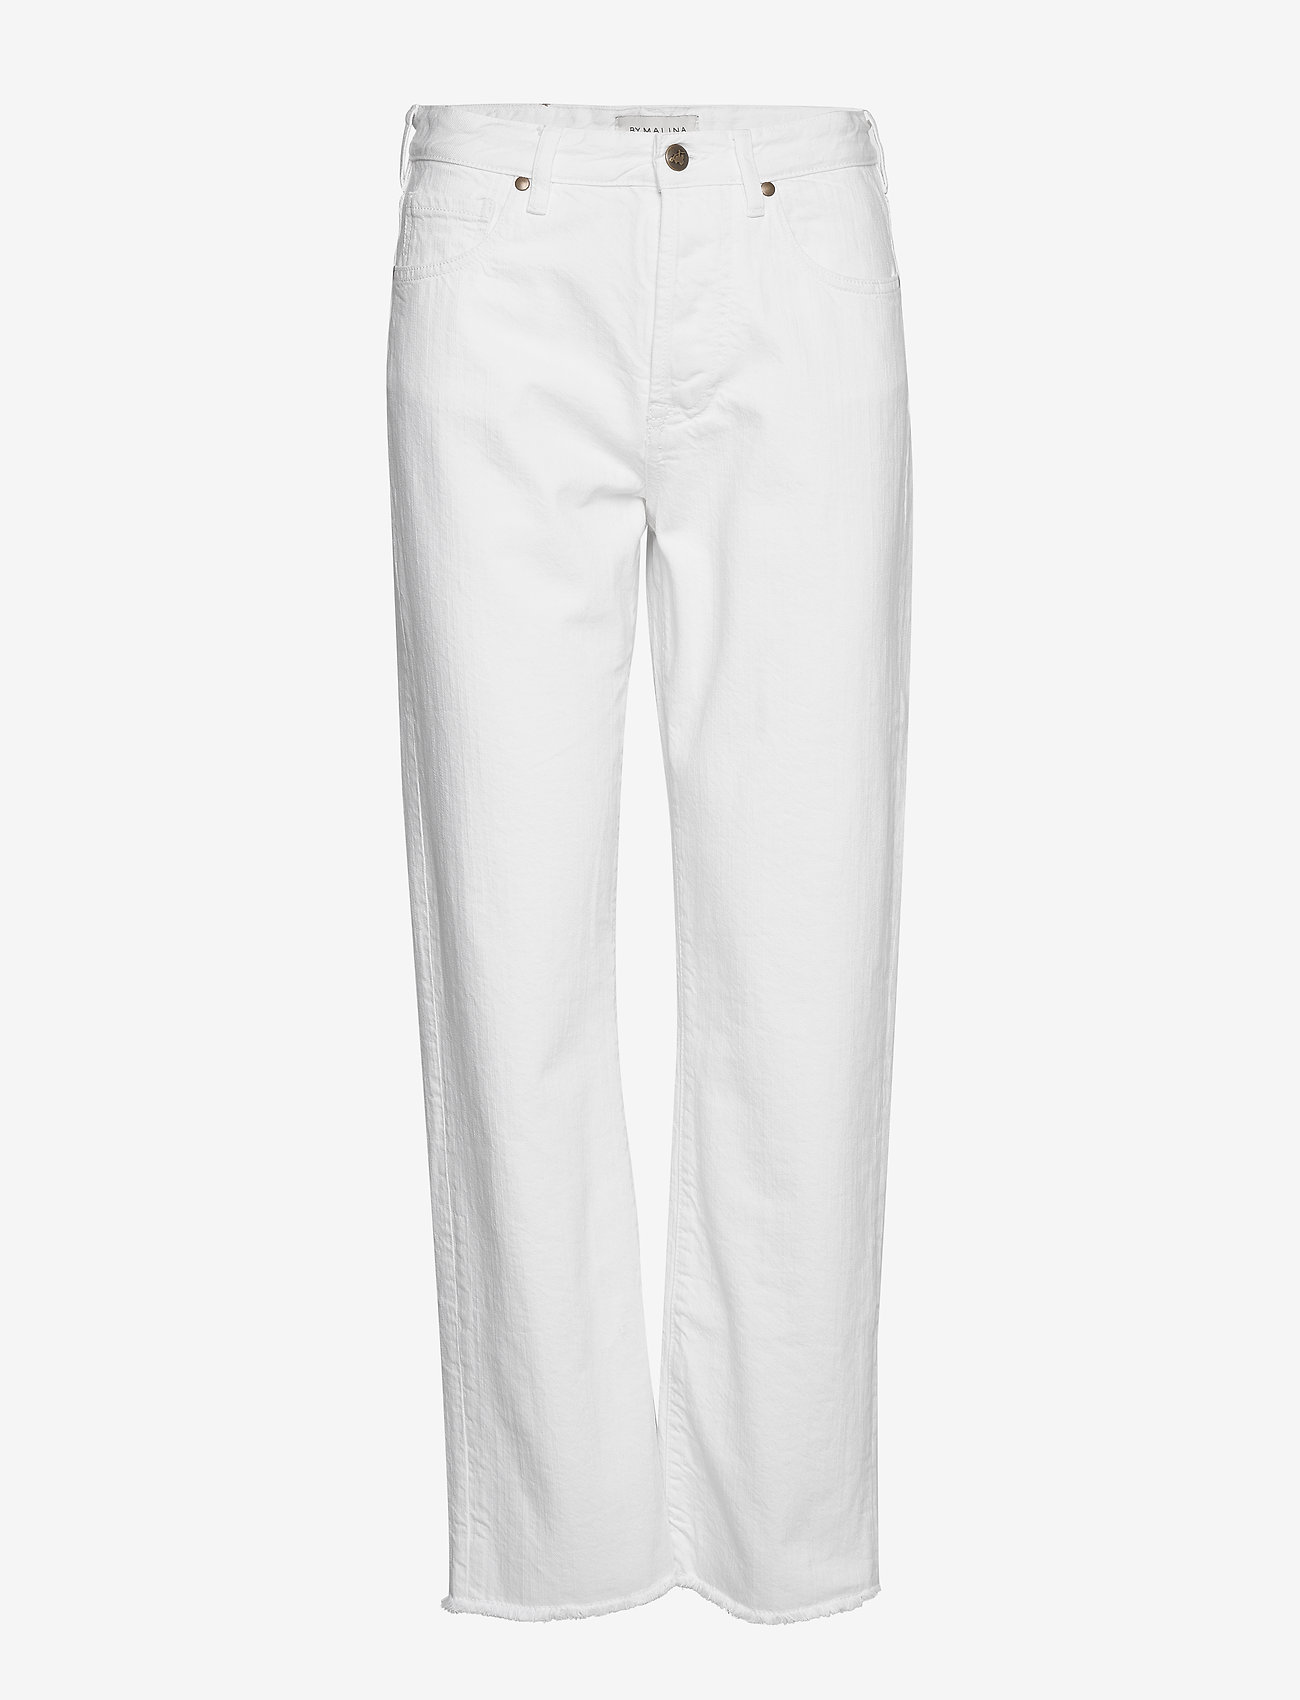 By Malina - Alexa jeans - straight regular - white - 0